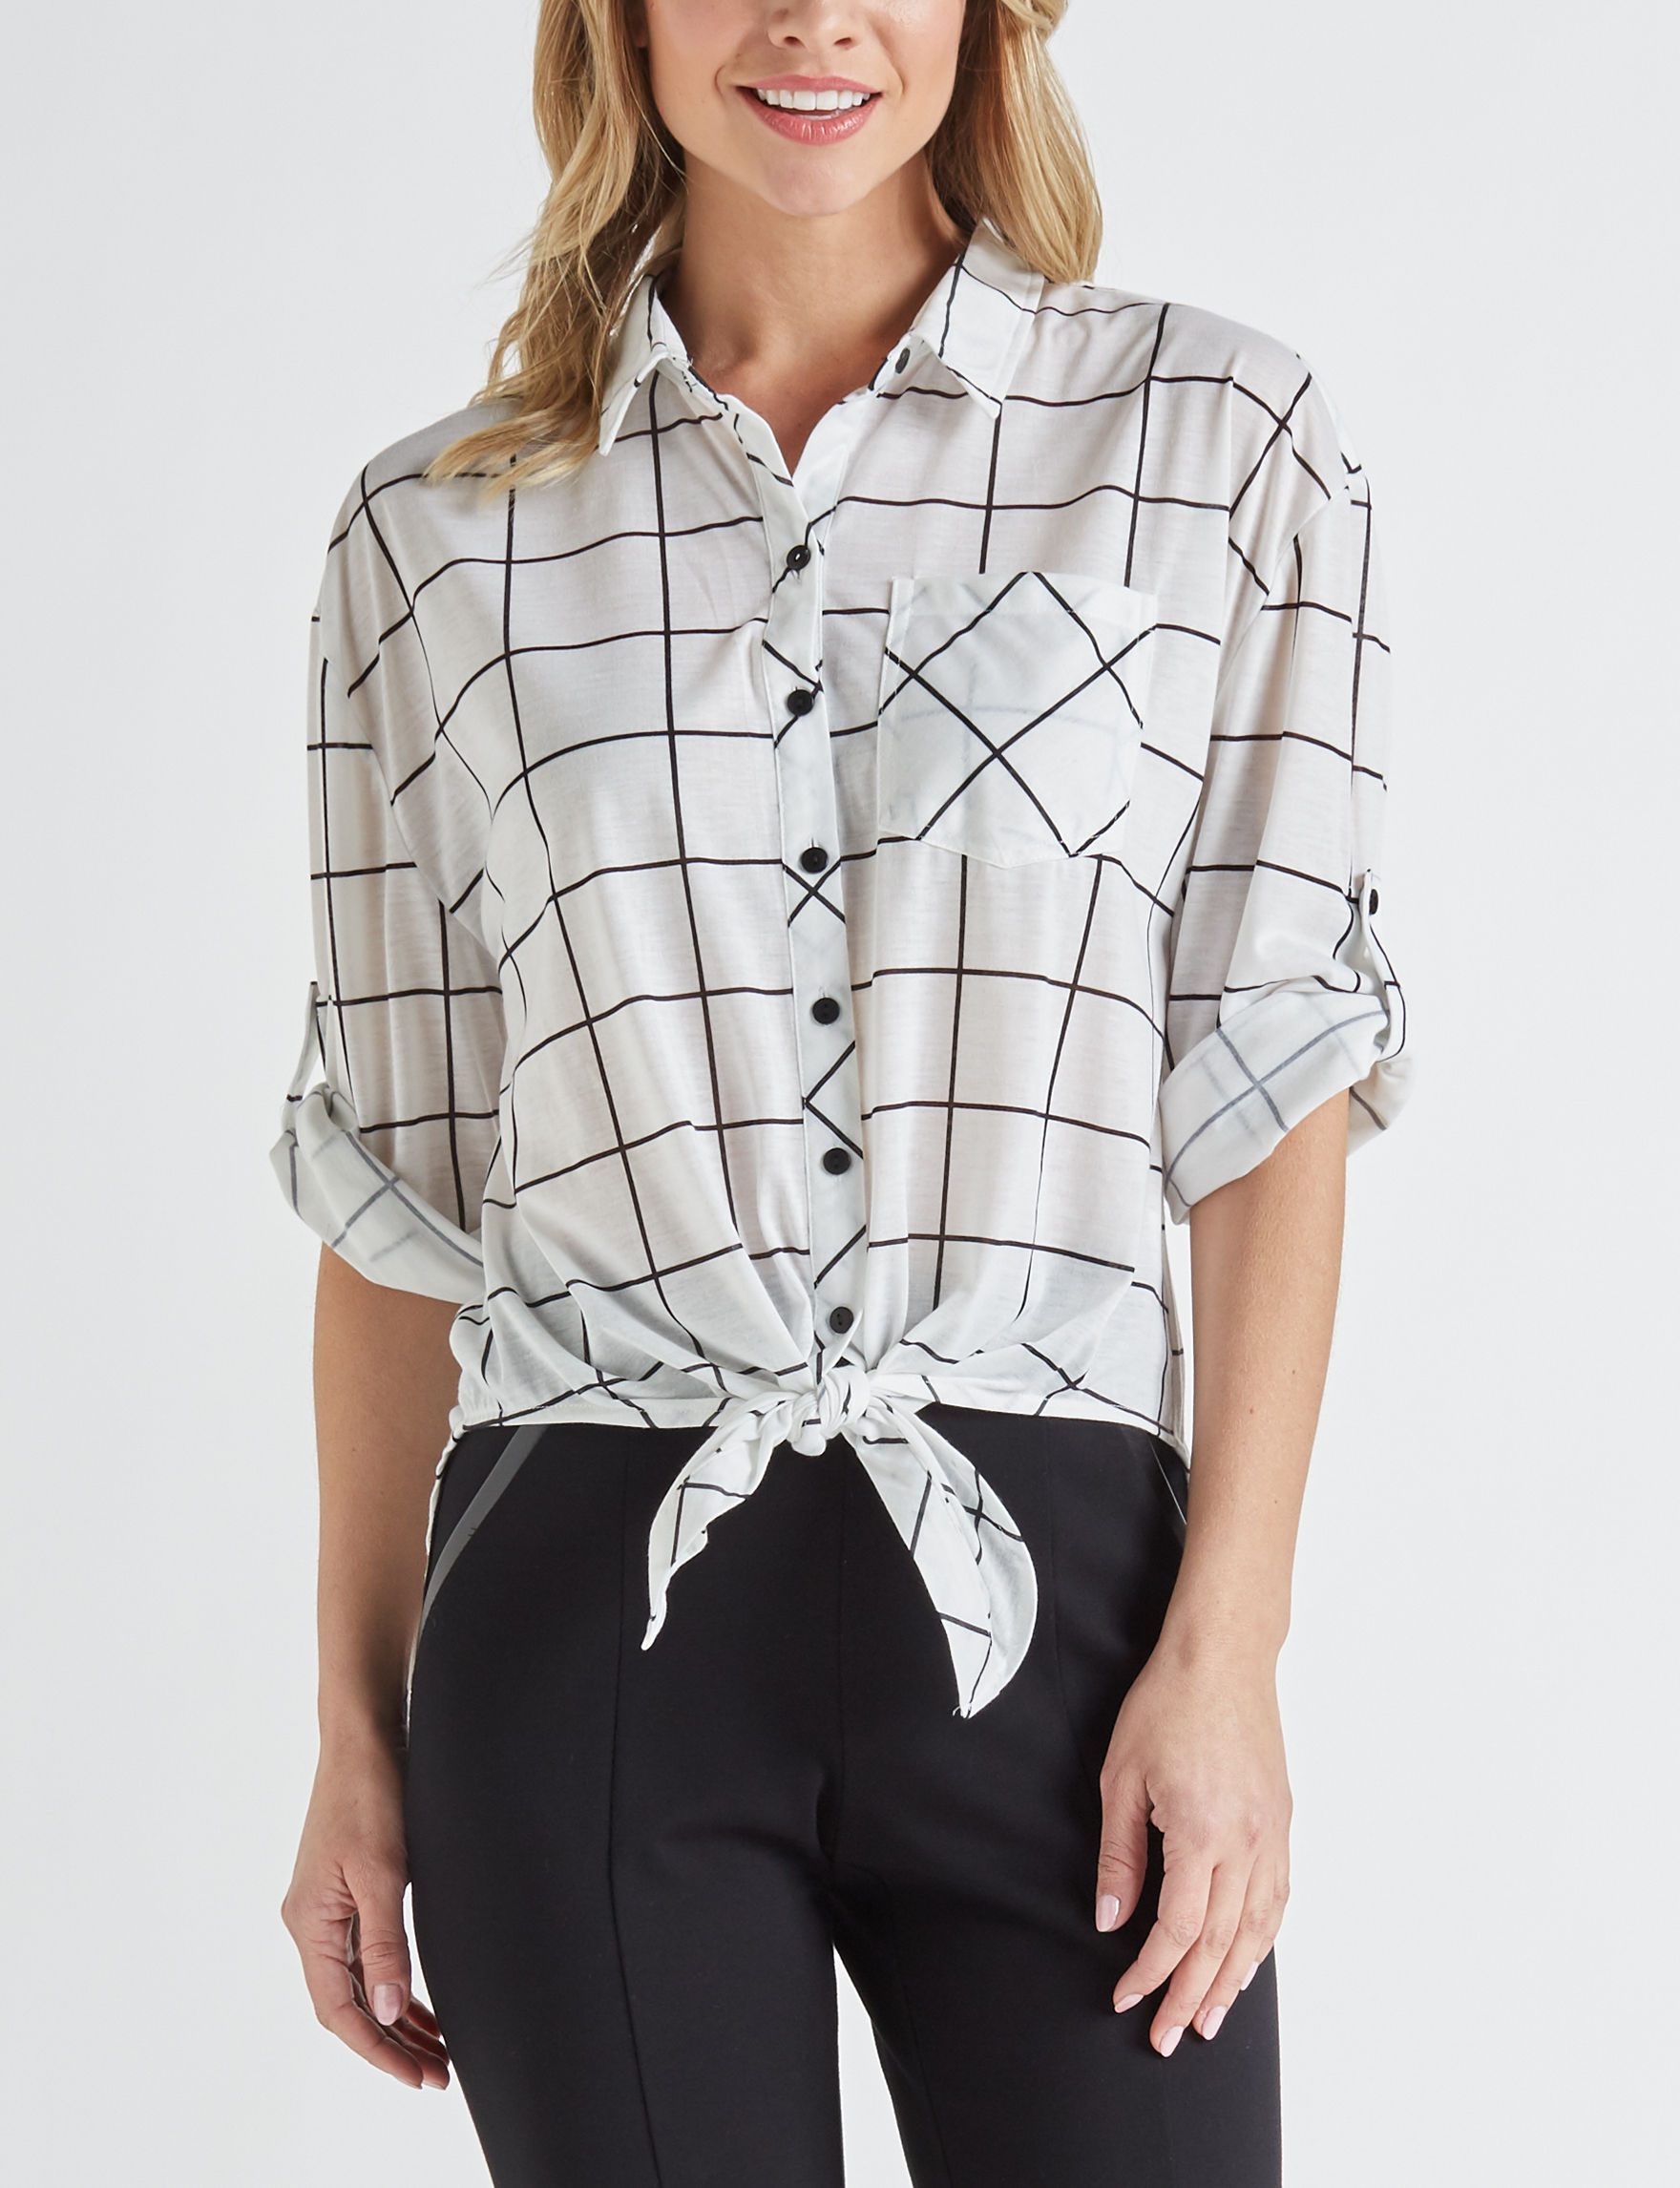 Eden & Olivia White Shirts & Blouses